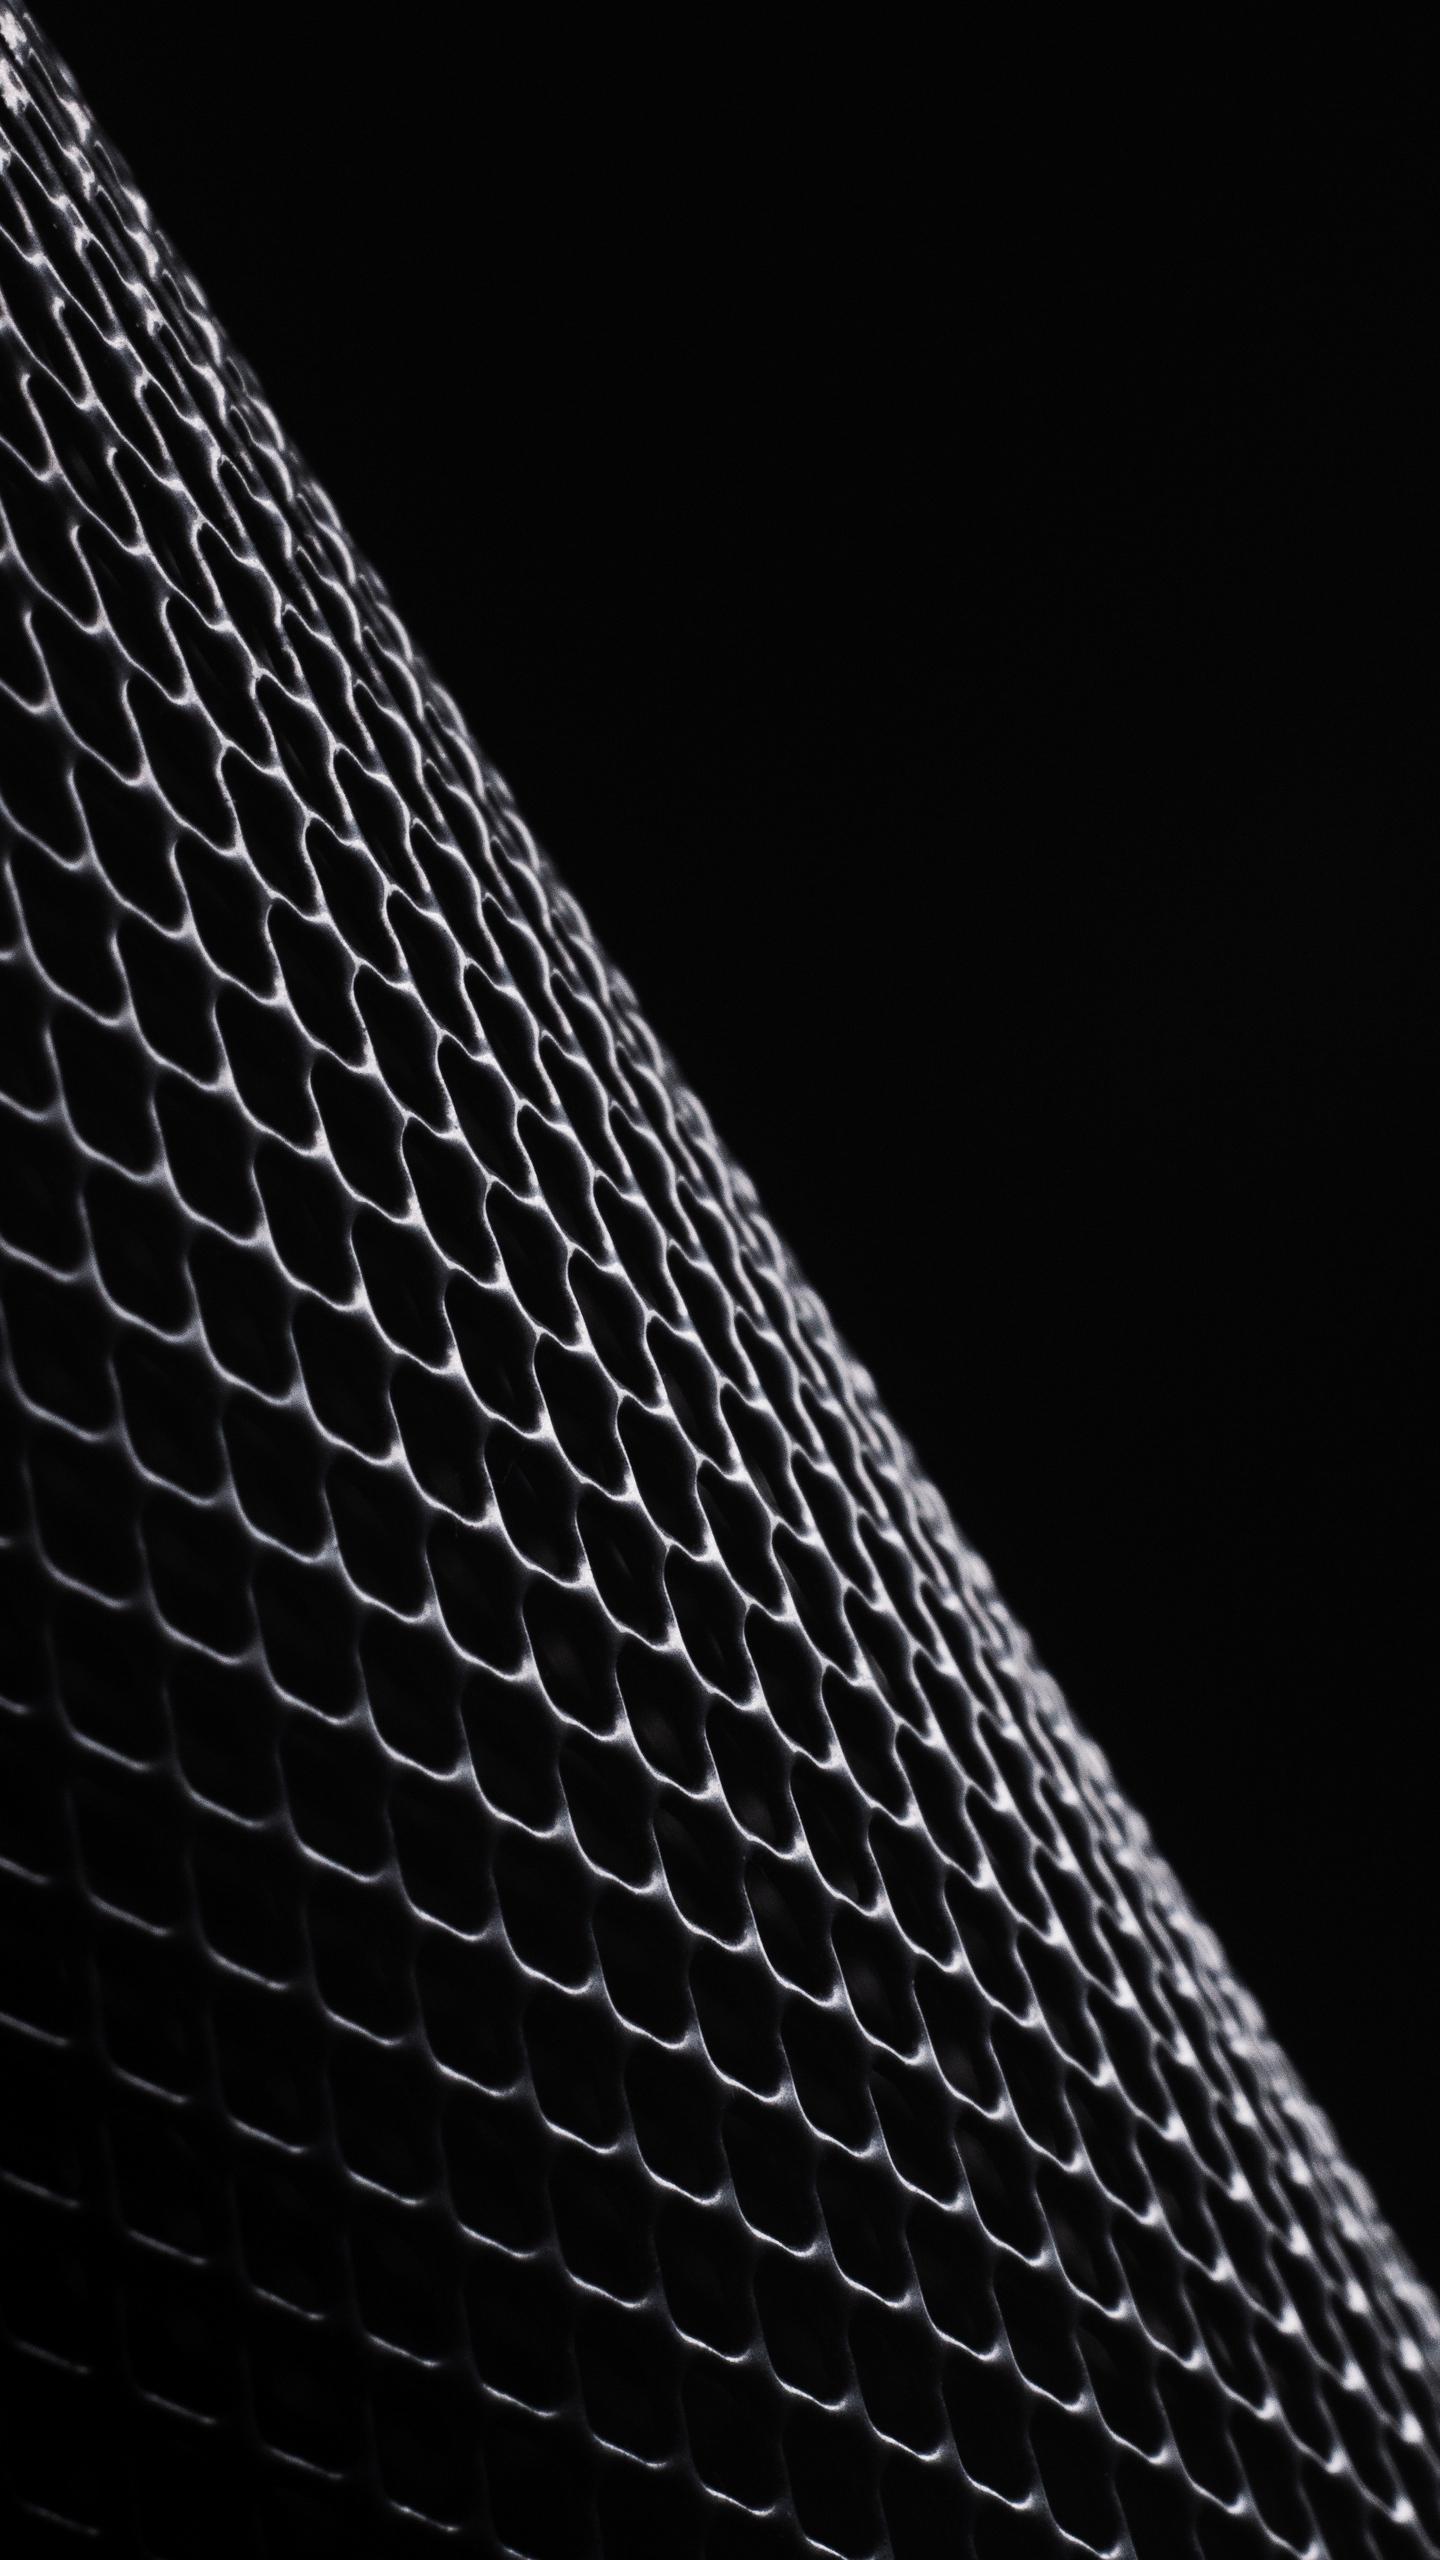 Wallpaper Mesh Structure Surface Dark Black Samsung Galaxy Edge Black 1440x2560 Download Hd Wallpaper Wallpapertip